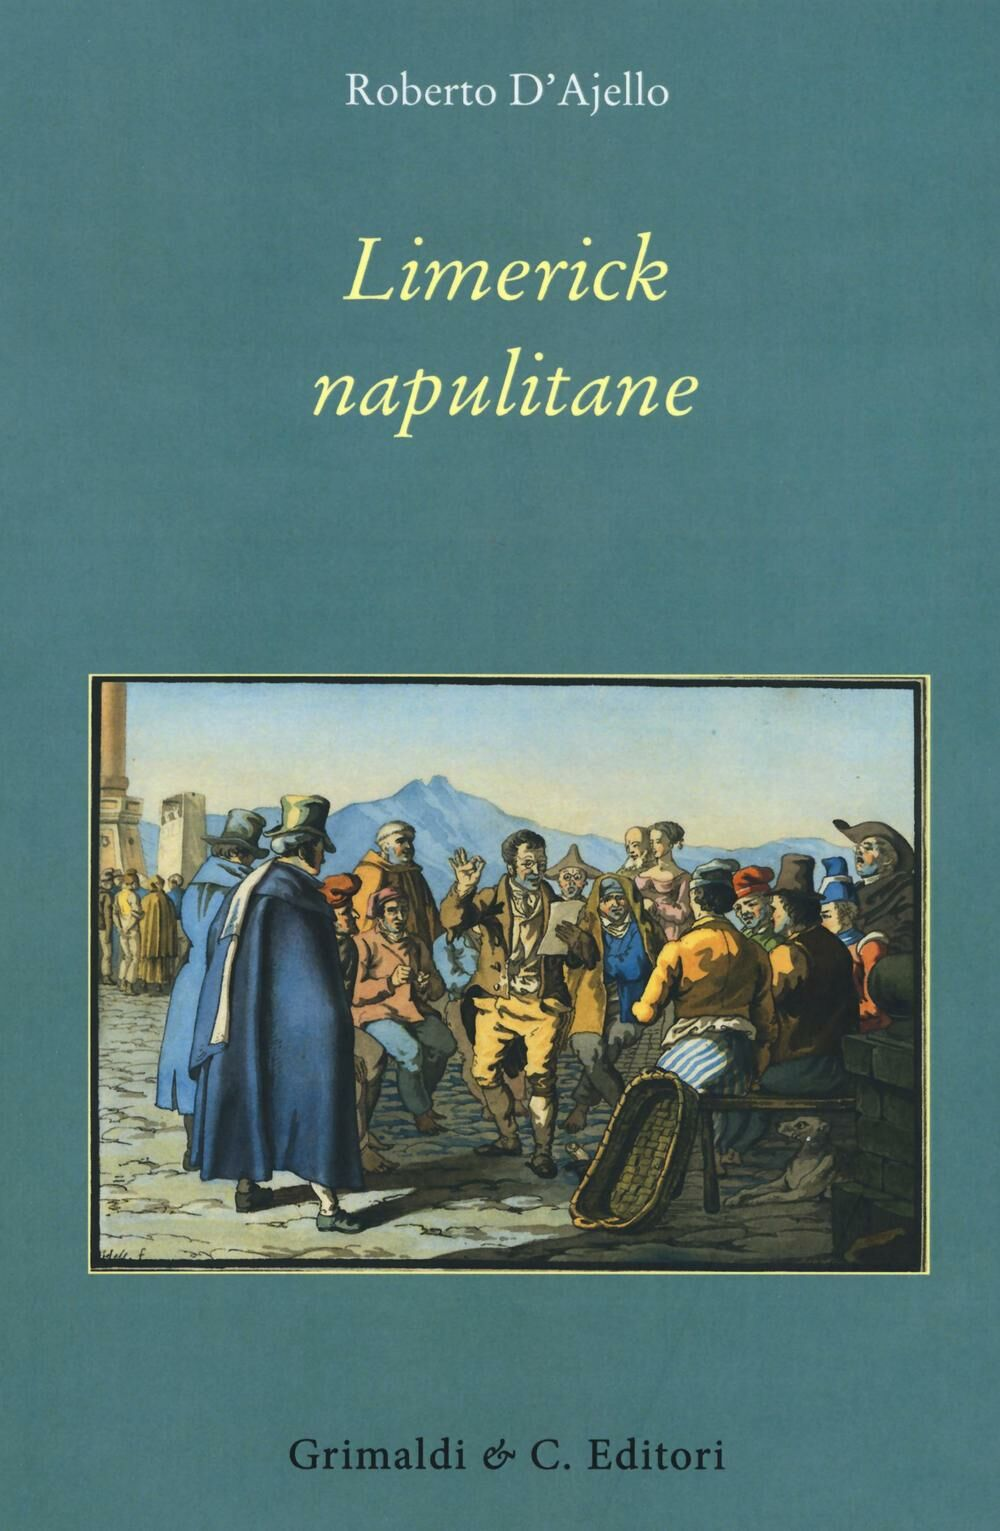 Limerick napulitane